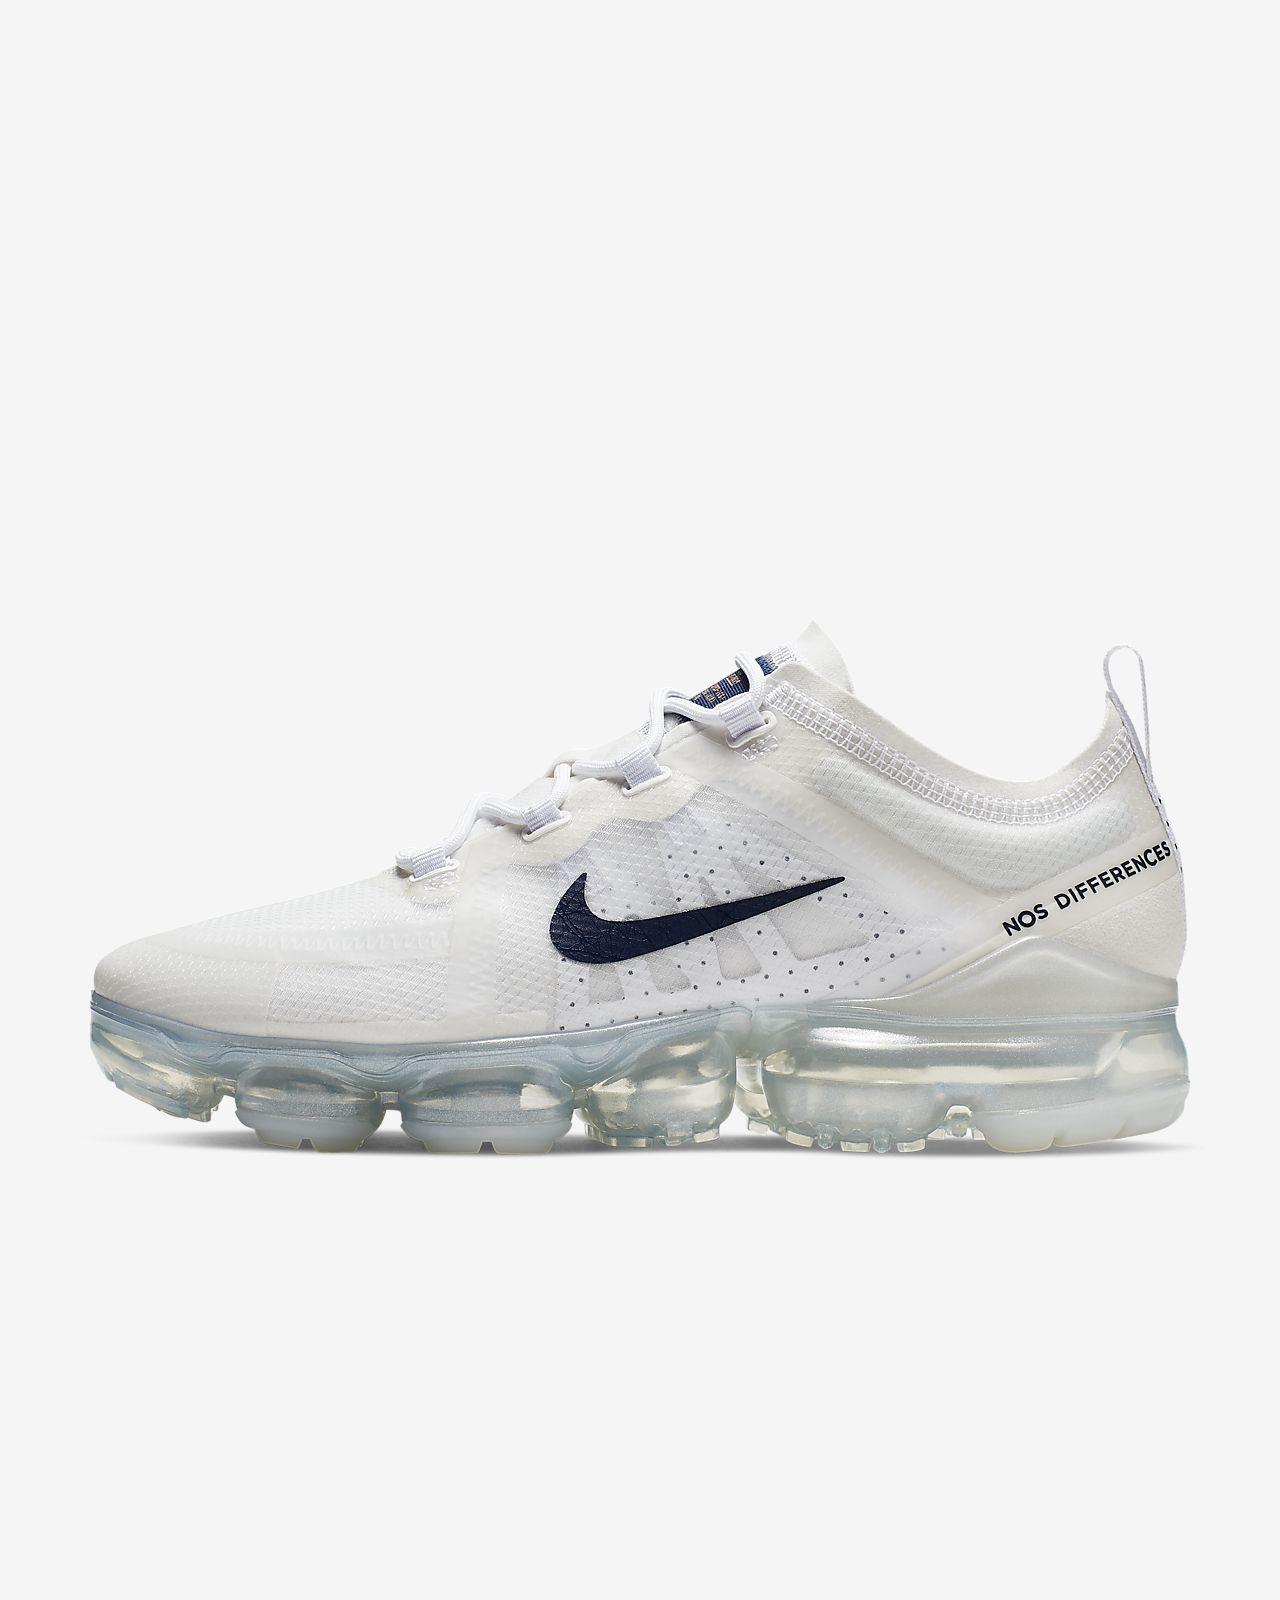 Nike Air VaporMax 2019 Unité Totale Kadın Ayakkabısı